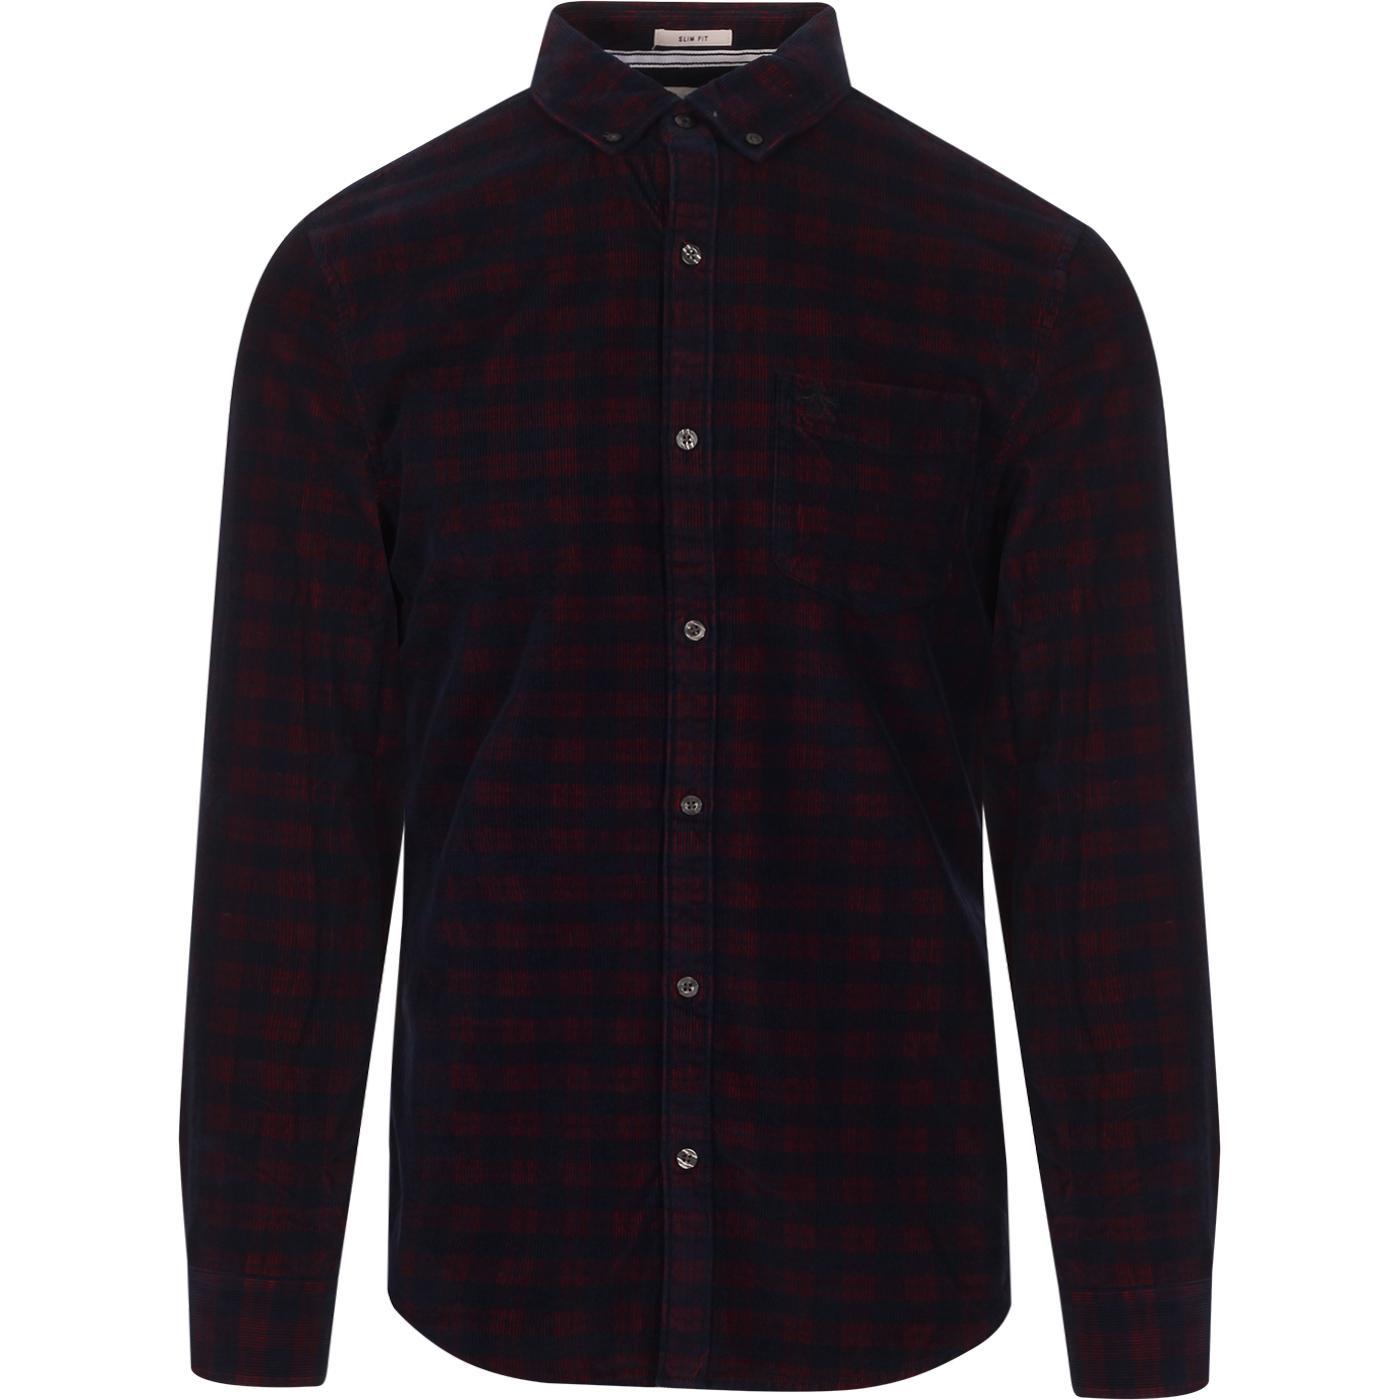 ORIGINAL PENGUIN Retro Yarn Dye Cord Check Shirt